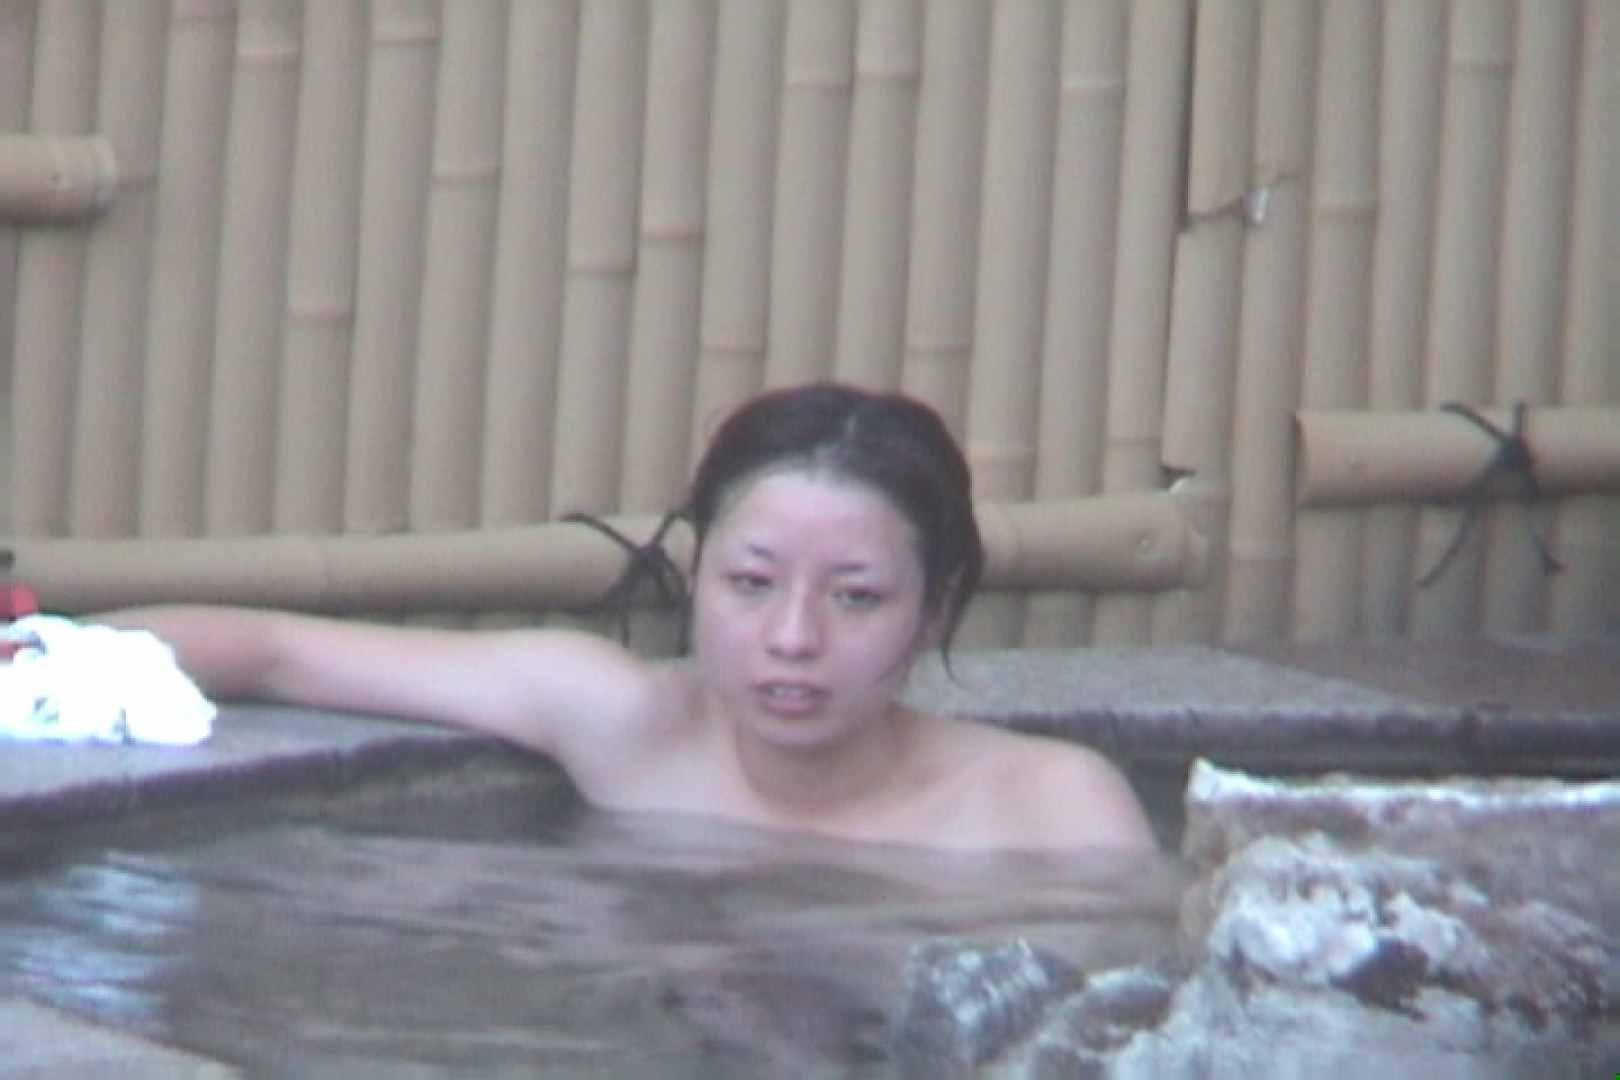 Aquaな露天風呂Vol.608 HなOL | 盗撮  89pic 52